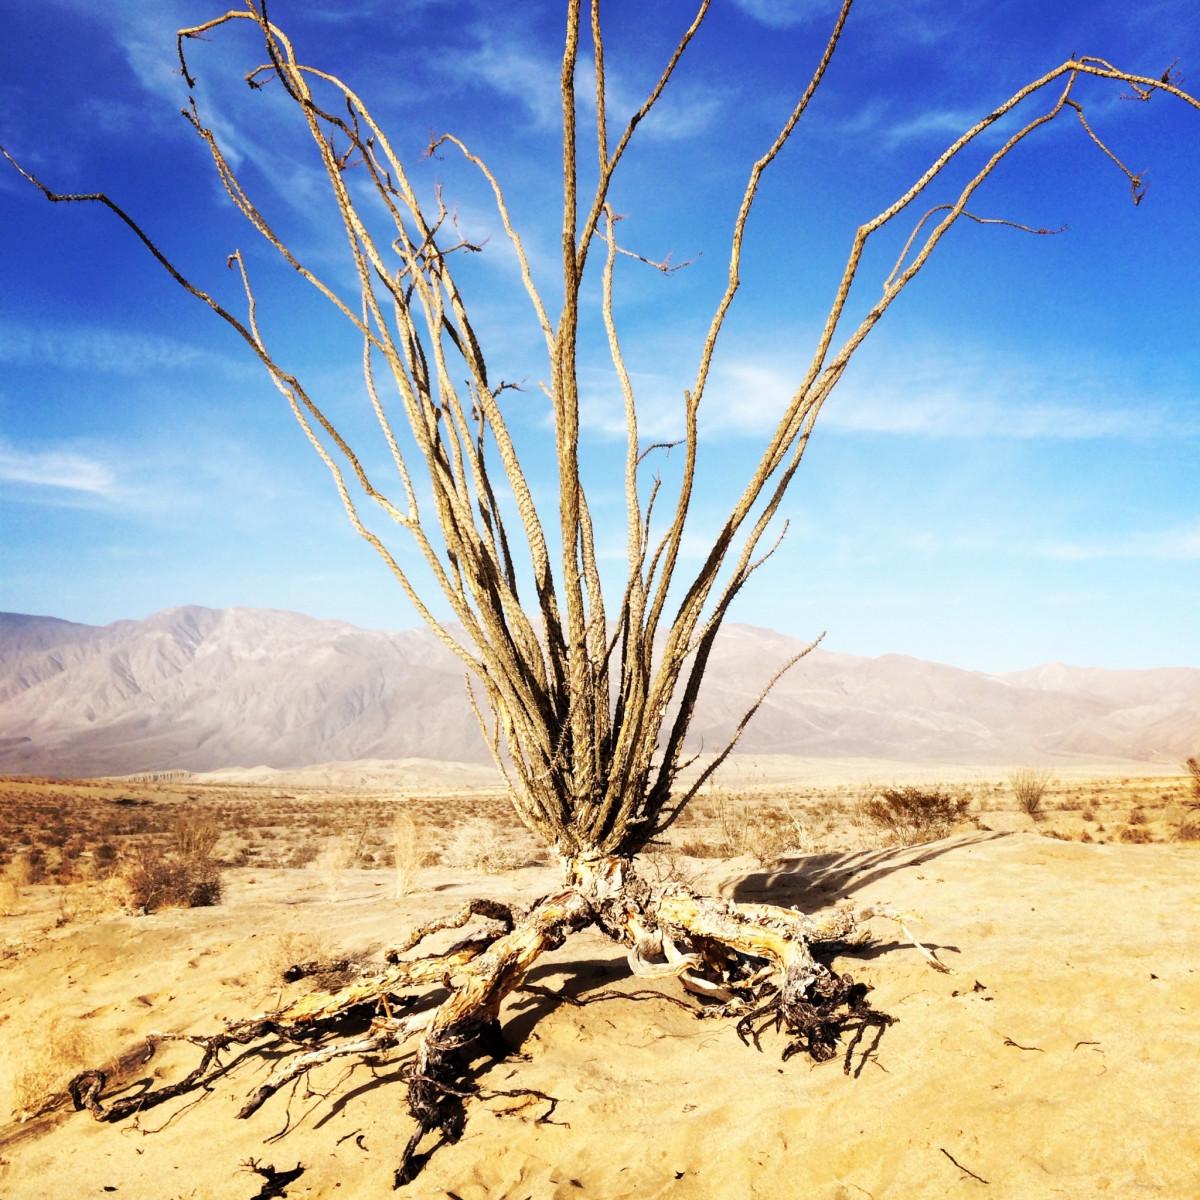 sahara desert plants - HD2048×2048